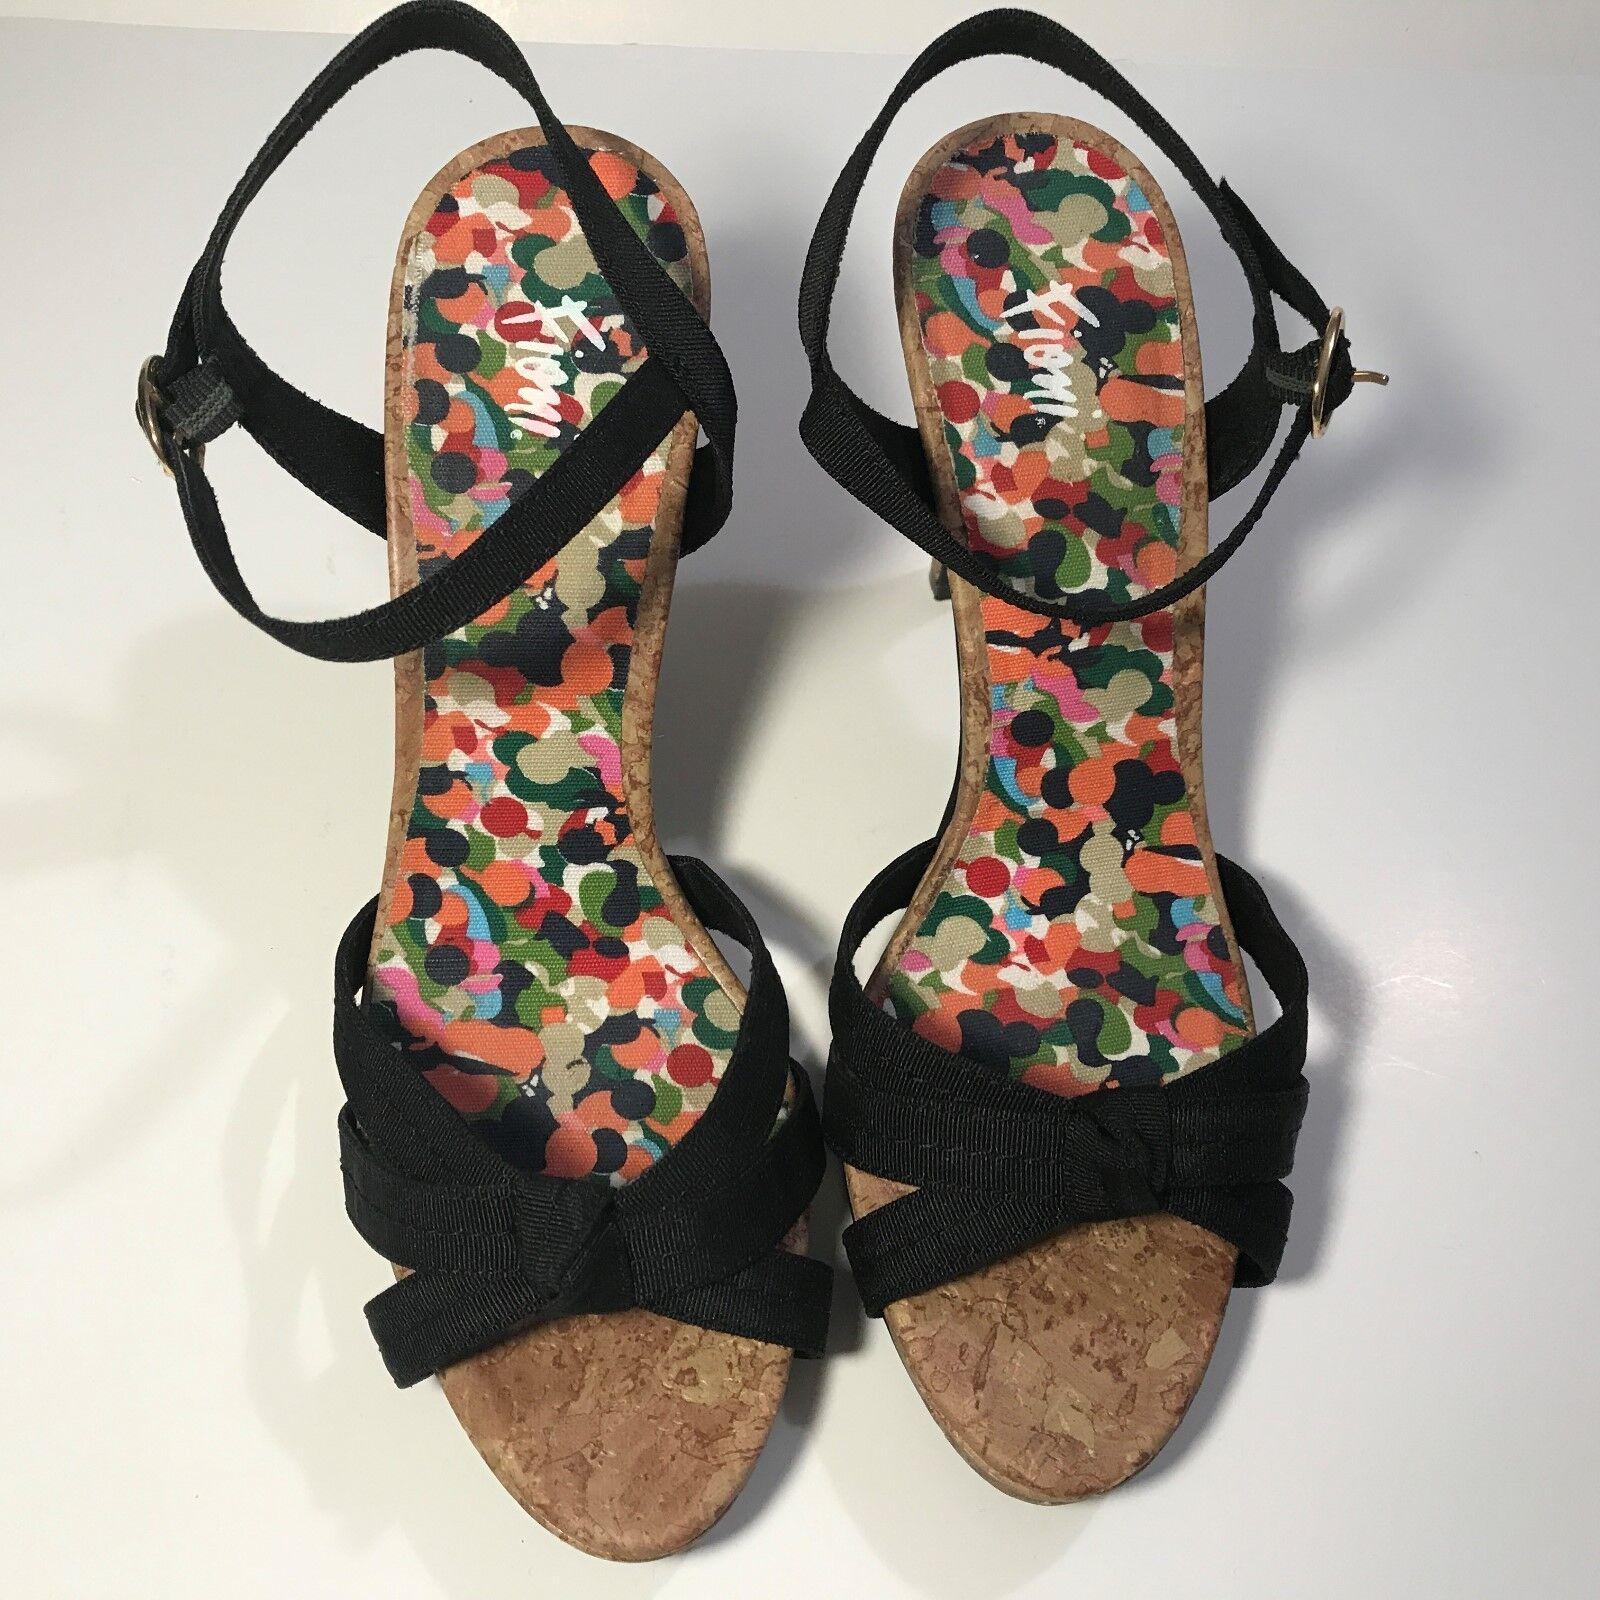 Fioni Black Women's Size 8.5 Strappy Black Fioni Fabric Heels Stiletto Shoes Floral Cork 6439a5